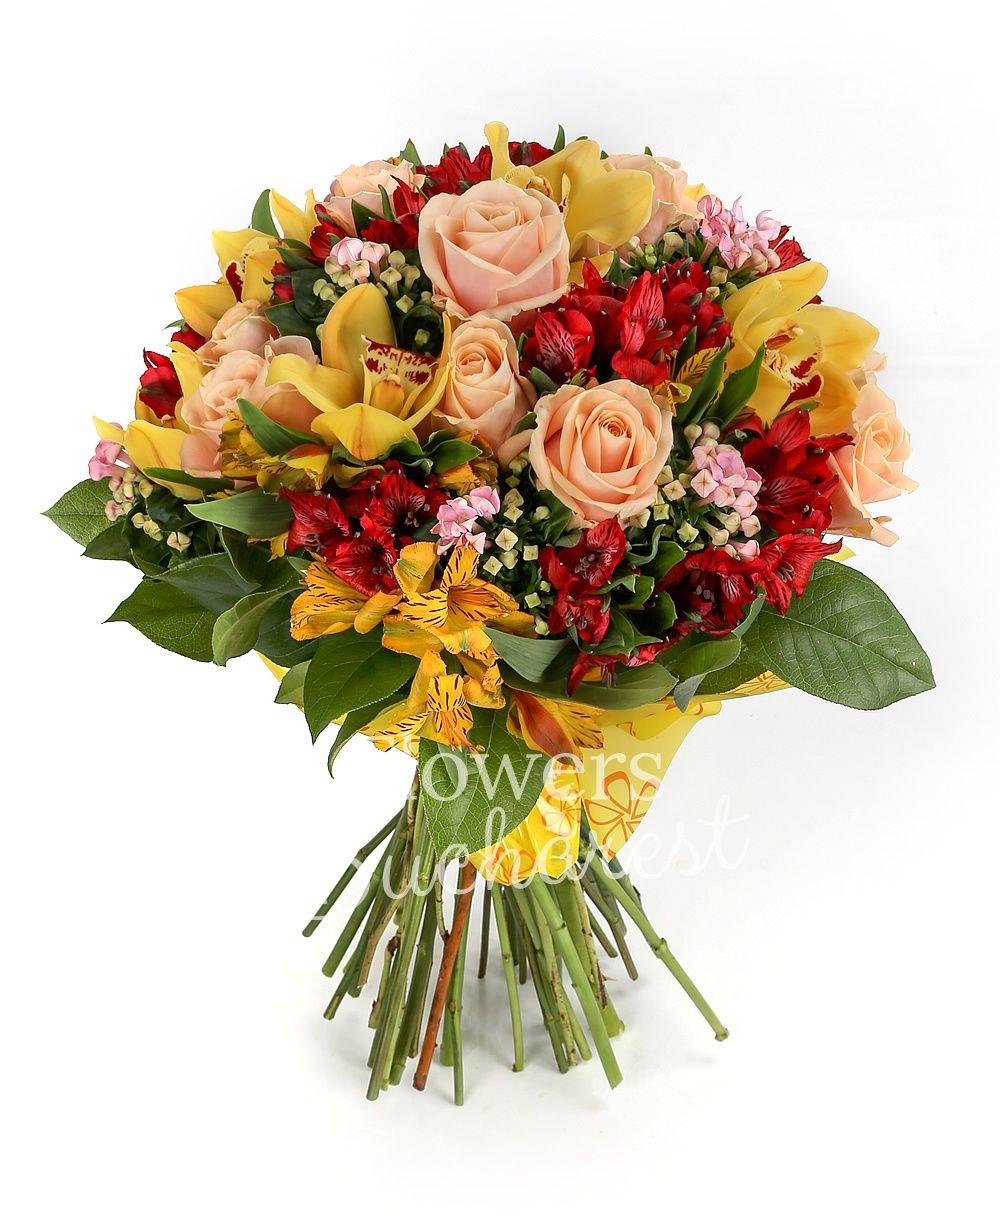 7 cream roses, 6 red alstroemeria, 5 orange alstroemeria, 5 pink bouvardia, green cymbidium, greenery